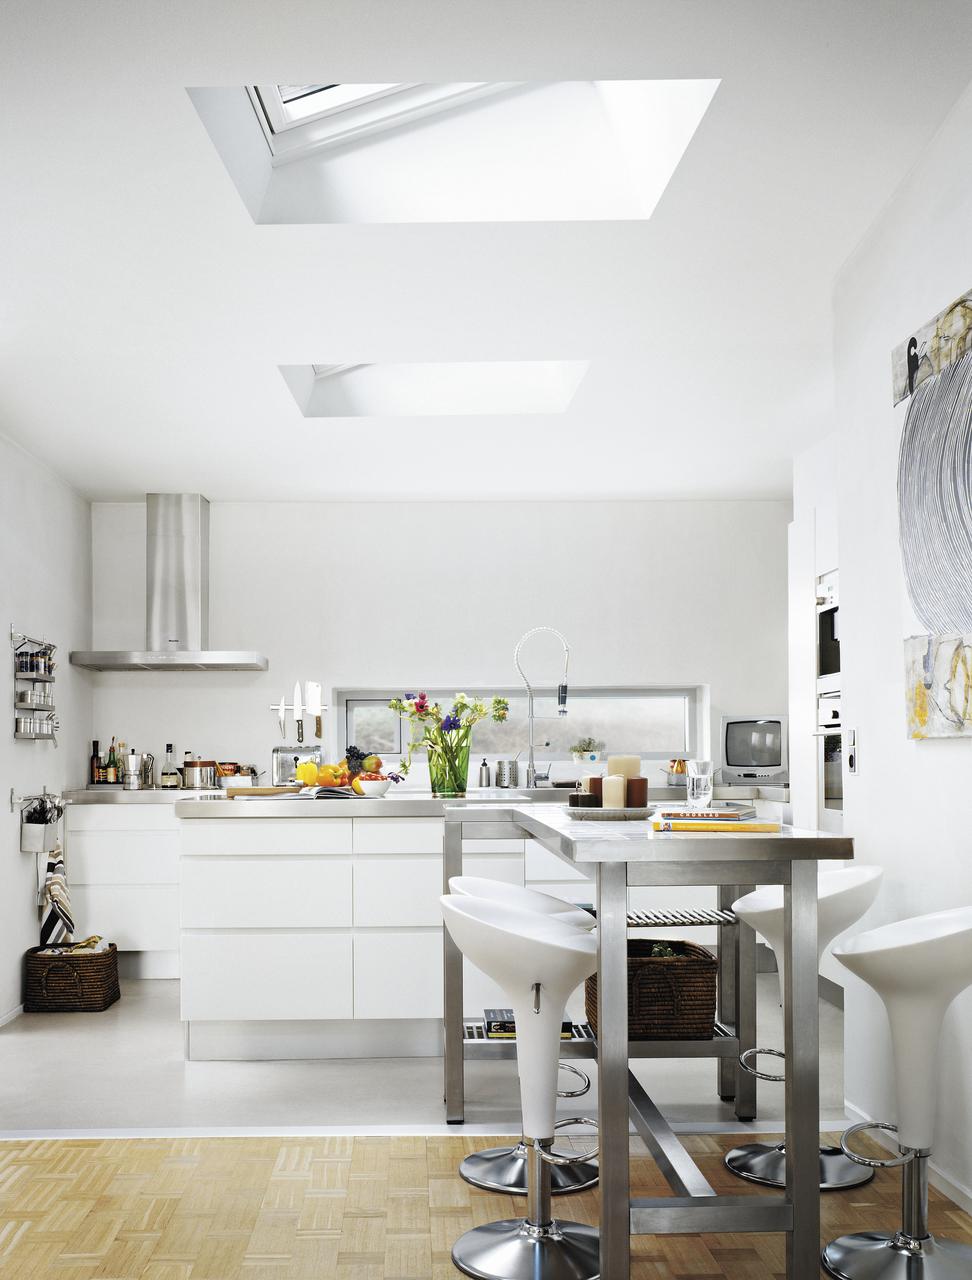 cucina luminosa con finestre